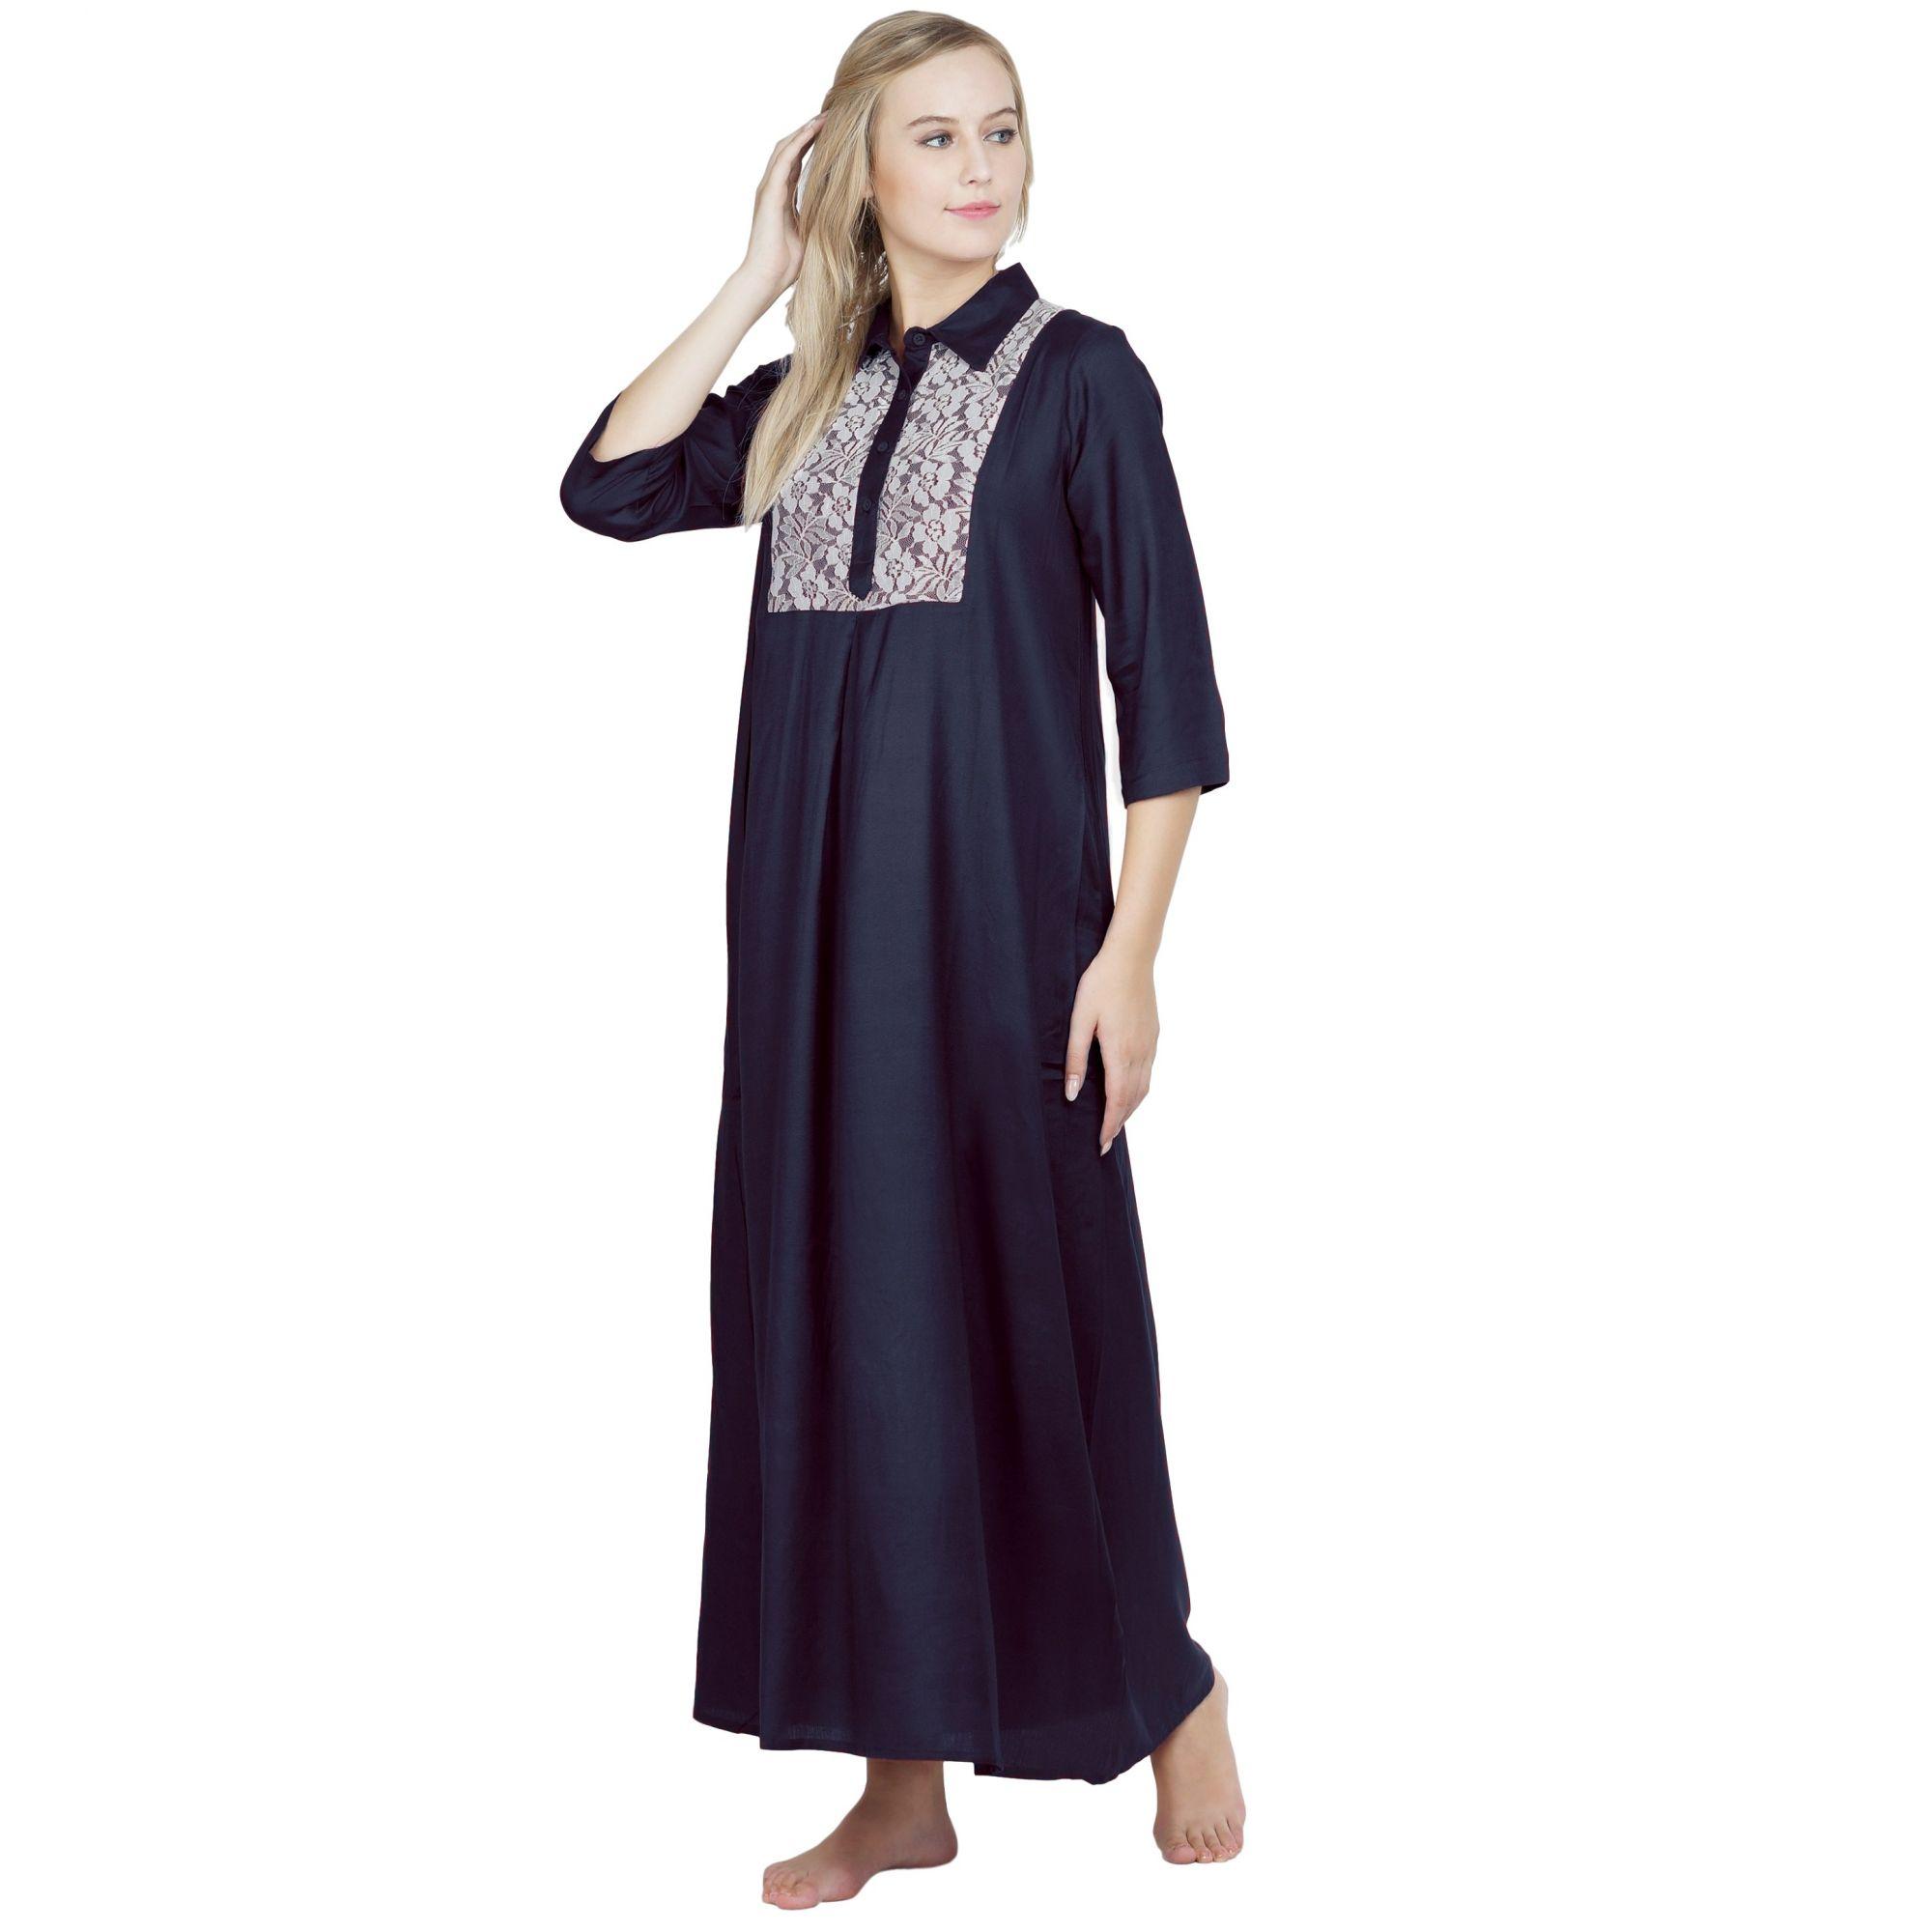 Stylish Lace Bodice Shirtdress Maxi Nighty Gown in Dark Blue